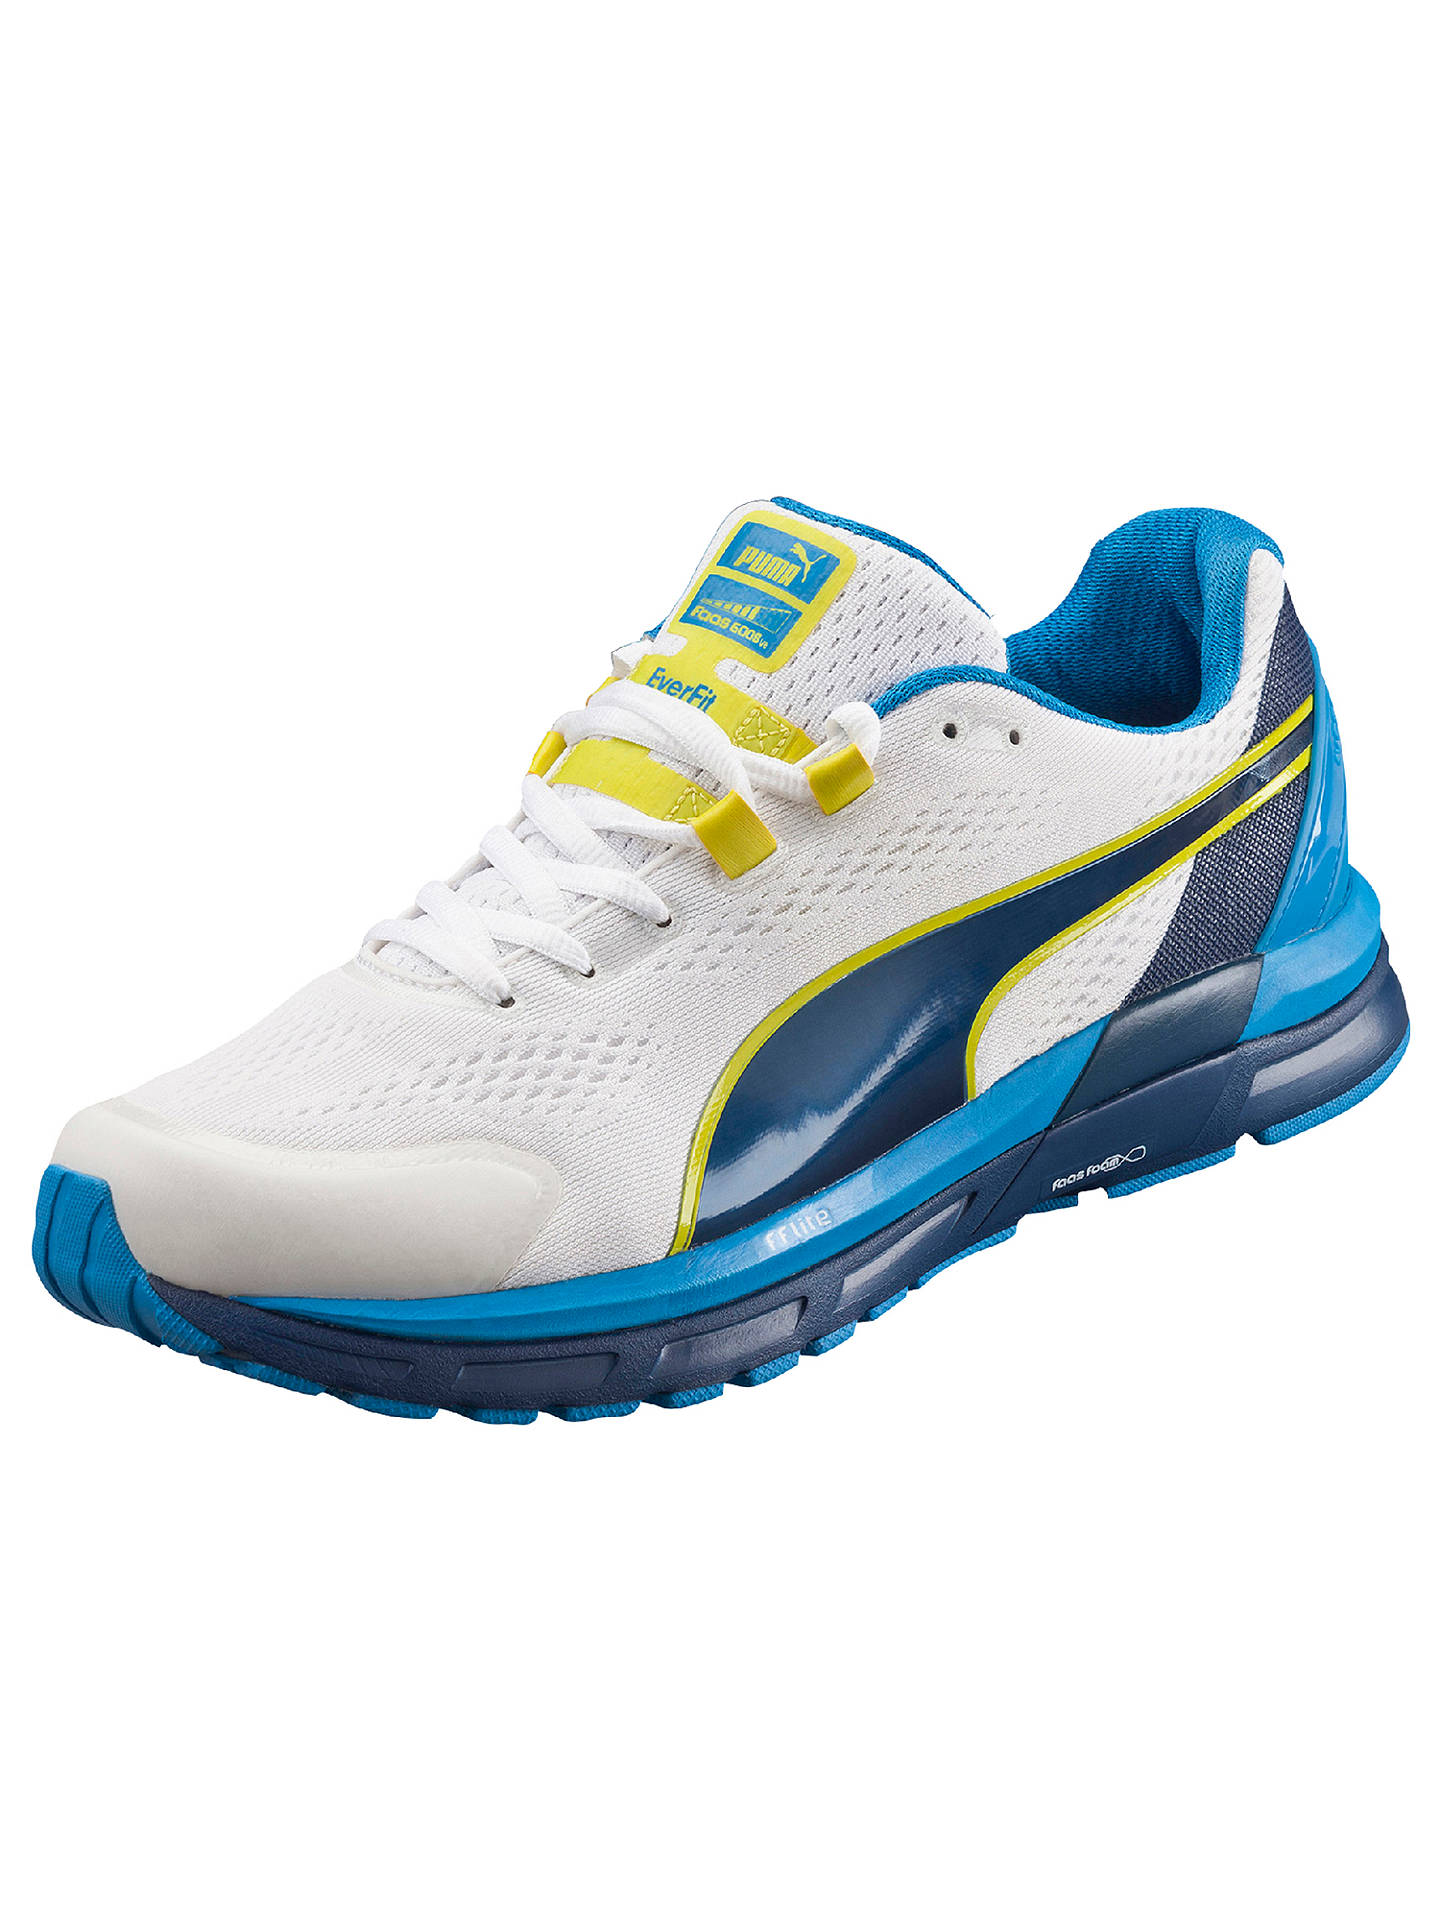 acdd392b3d3a ... BuyPuma Faas 600 V2 Men s Running Shoes